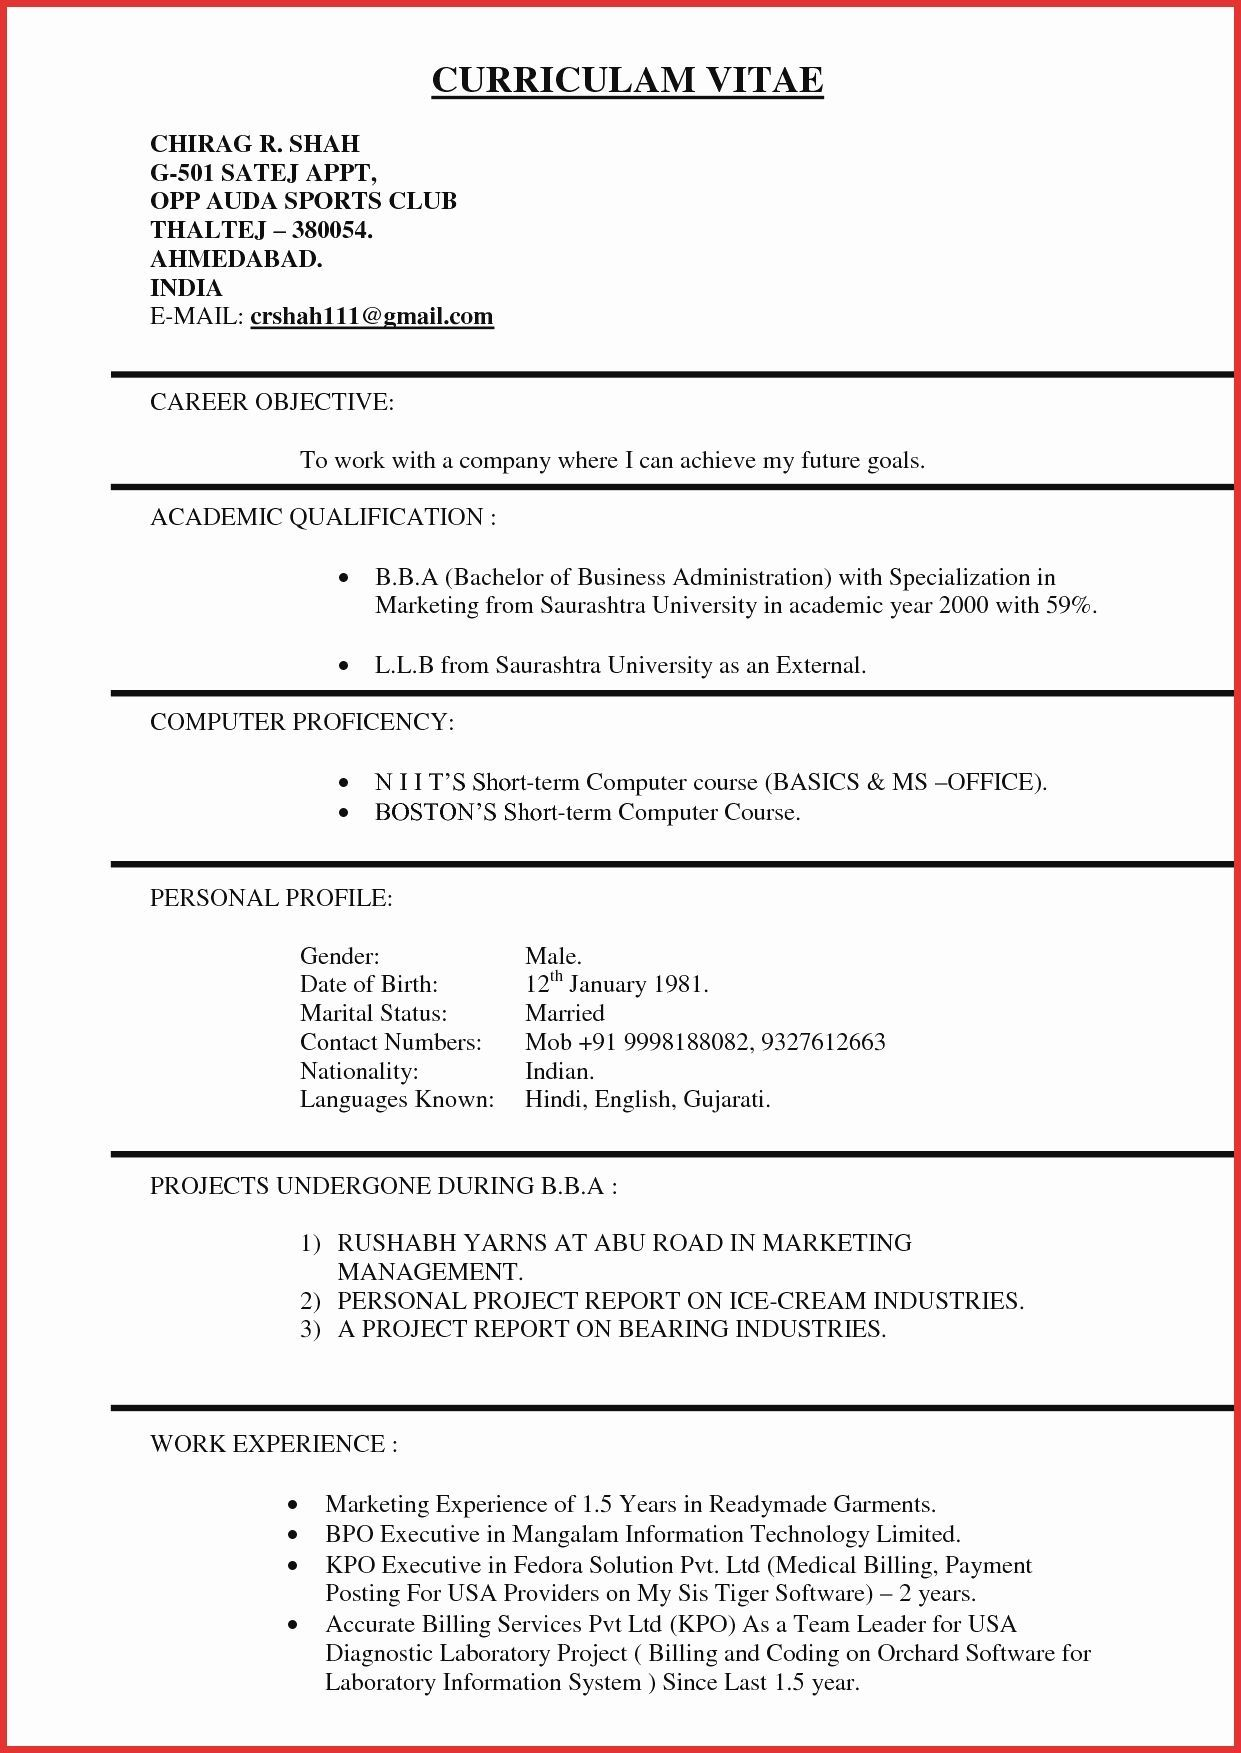 Sales Manager Resume Pdf Job resume format, Resume format